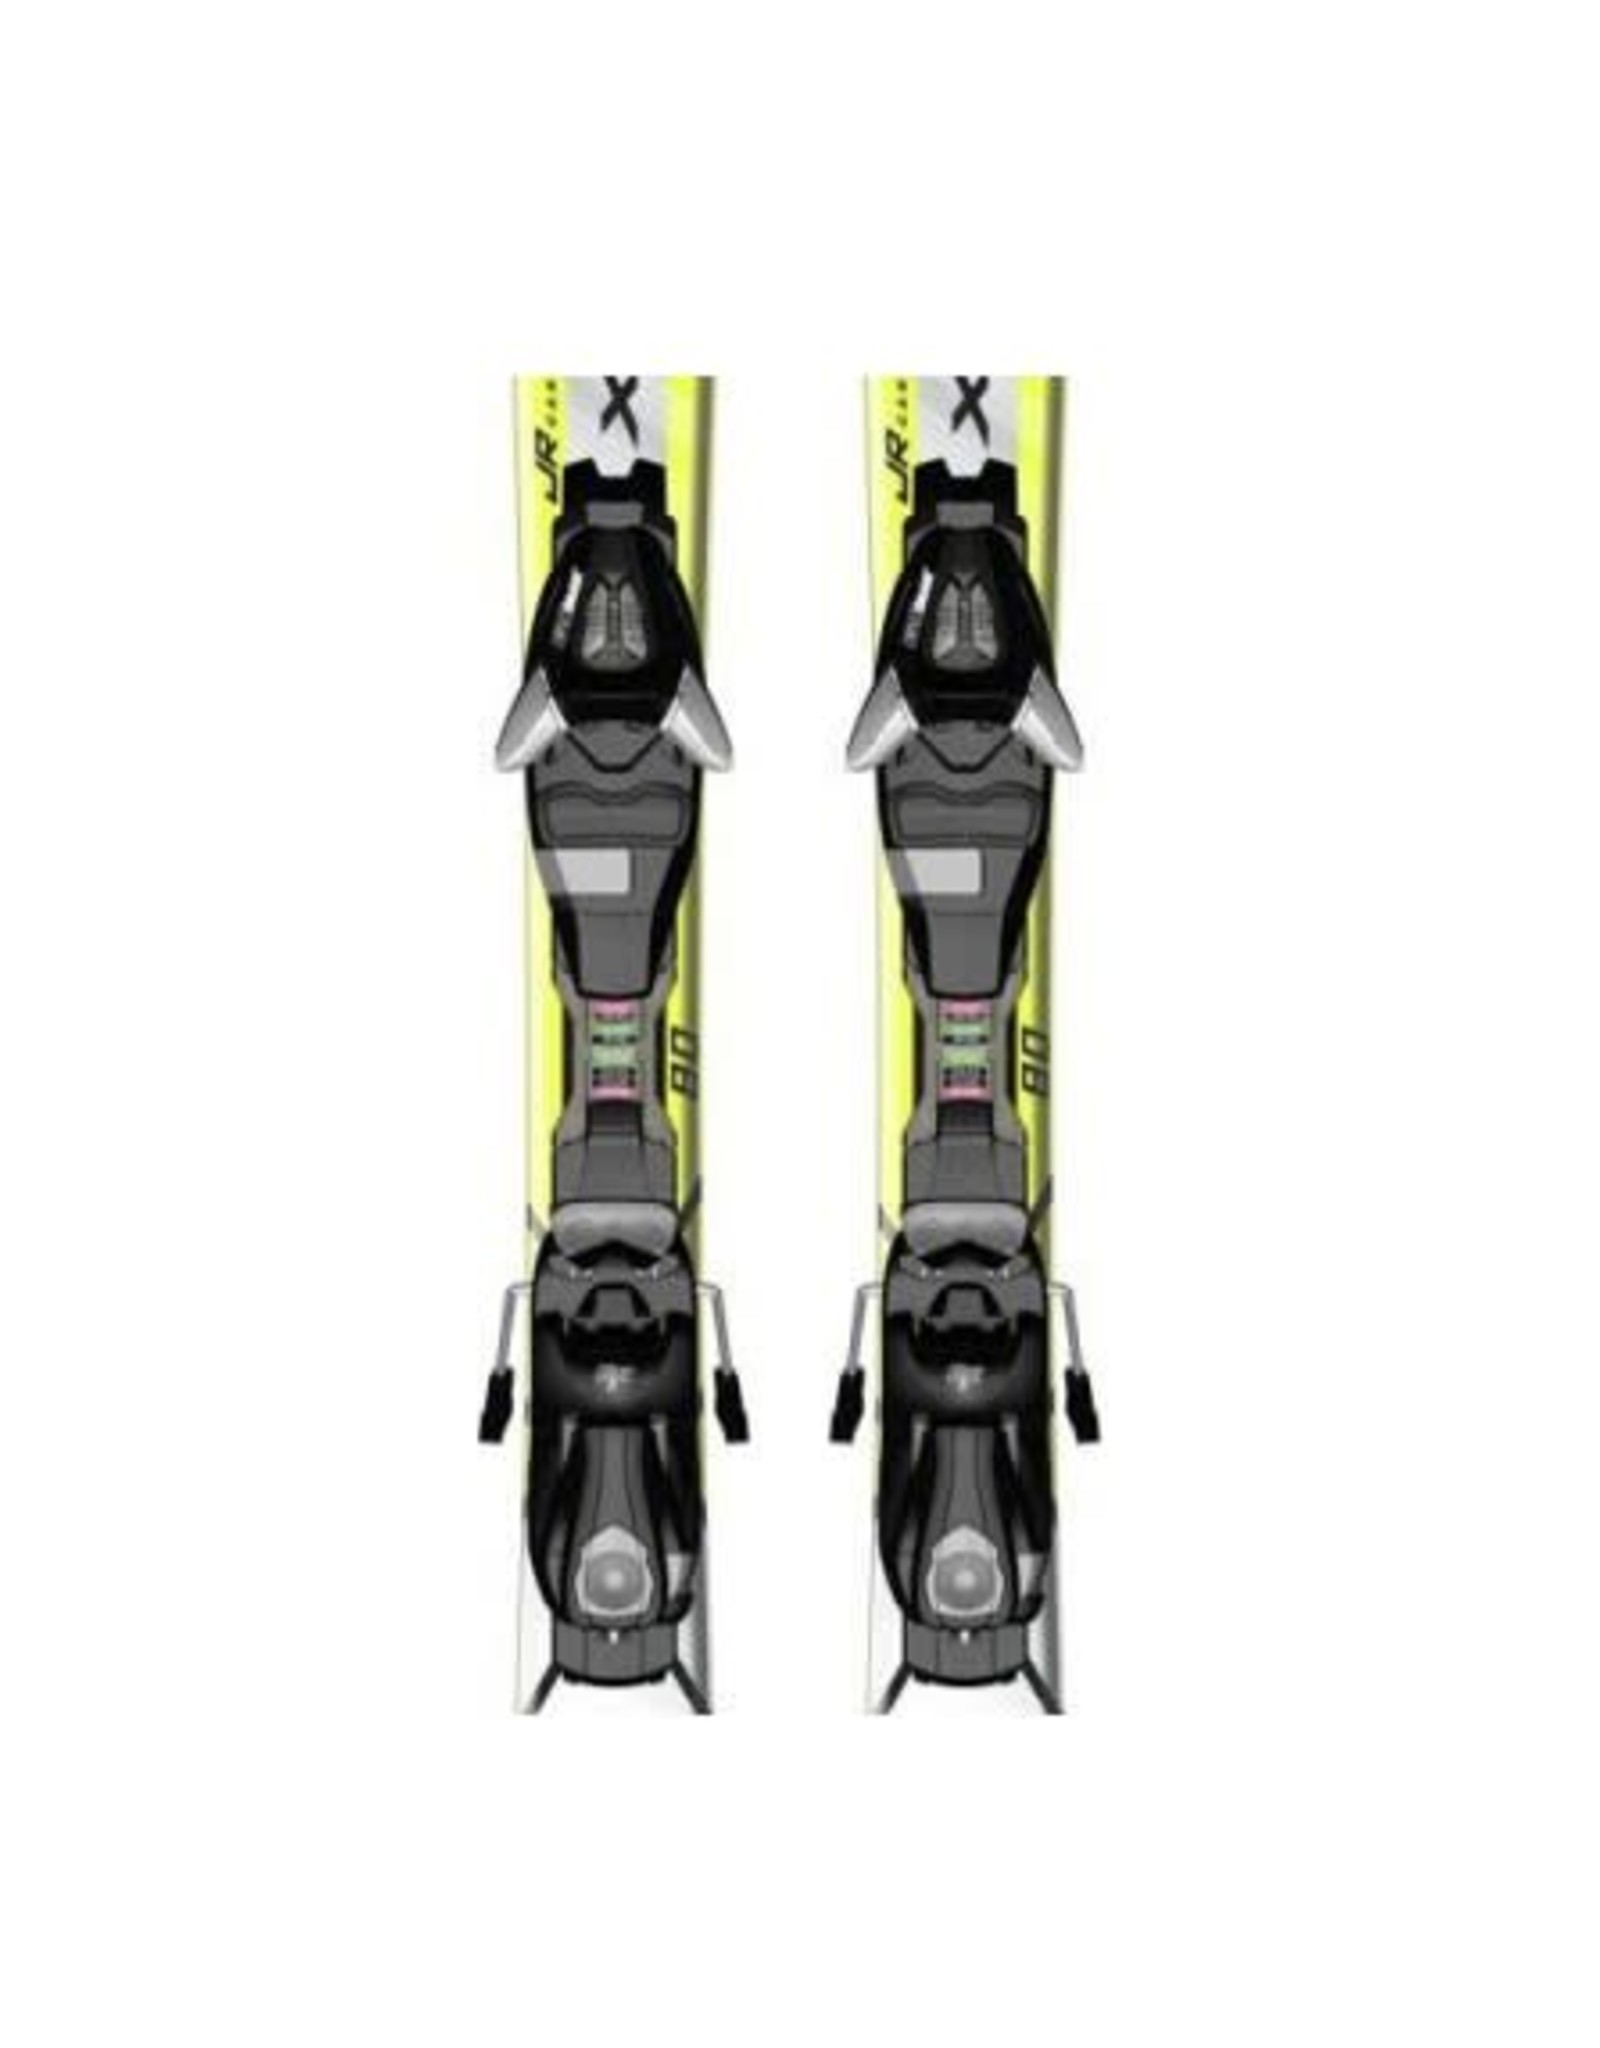 SALOMON Salomon X-max jr XS Ski's NIEUW